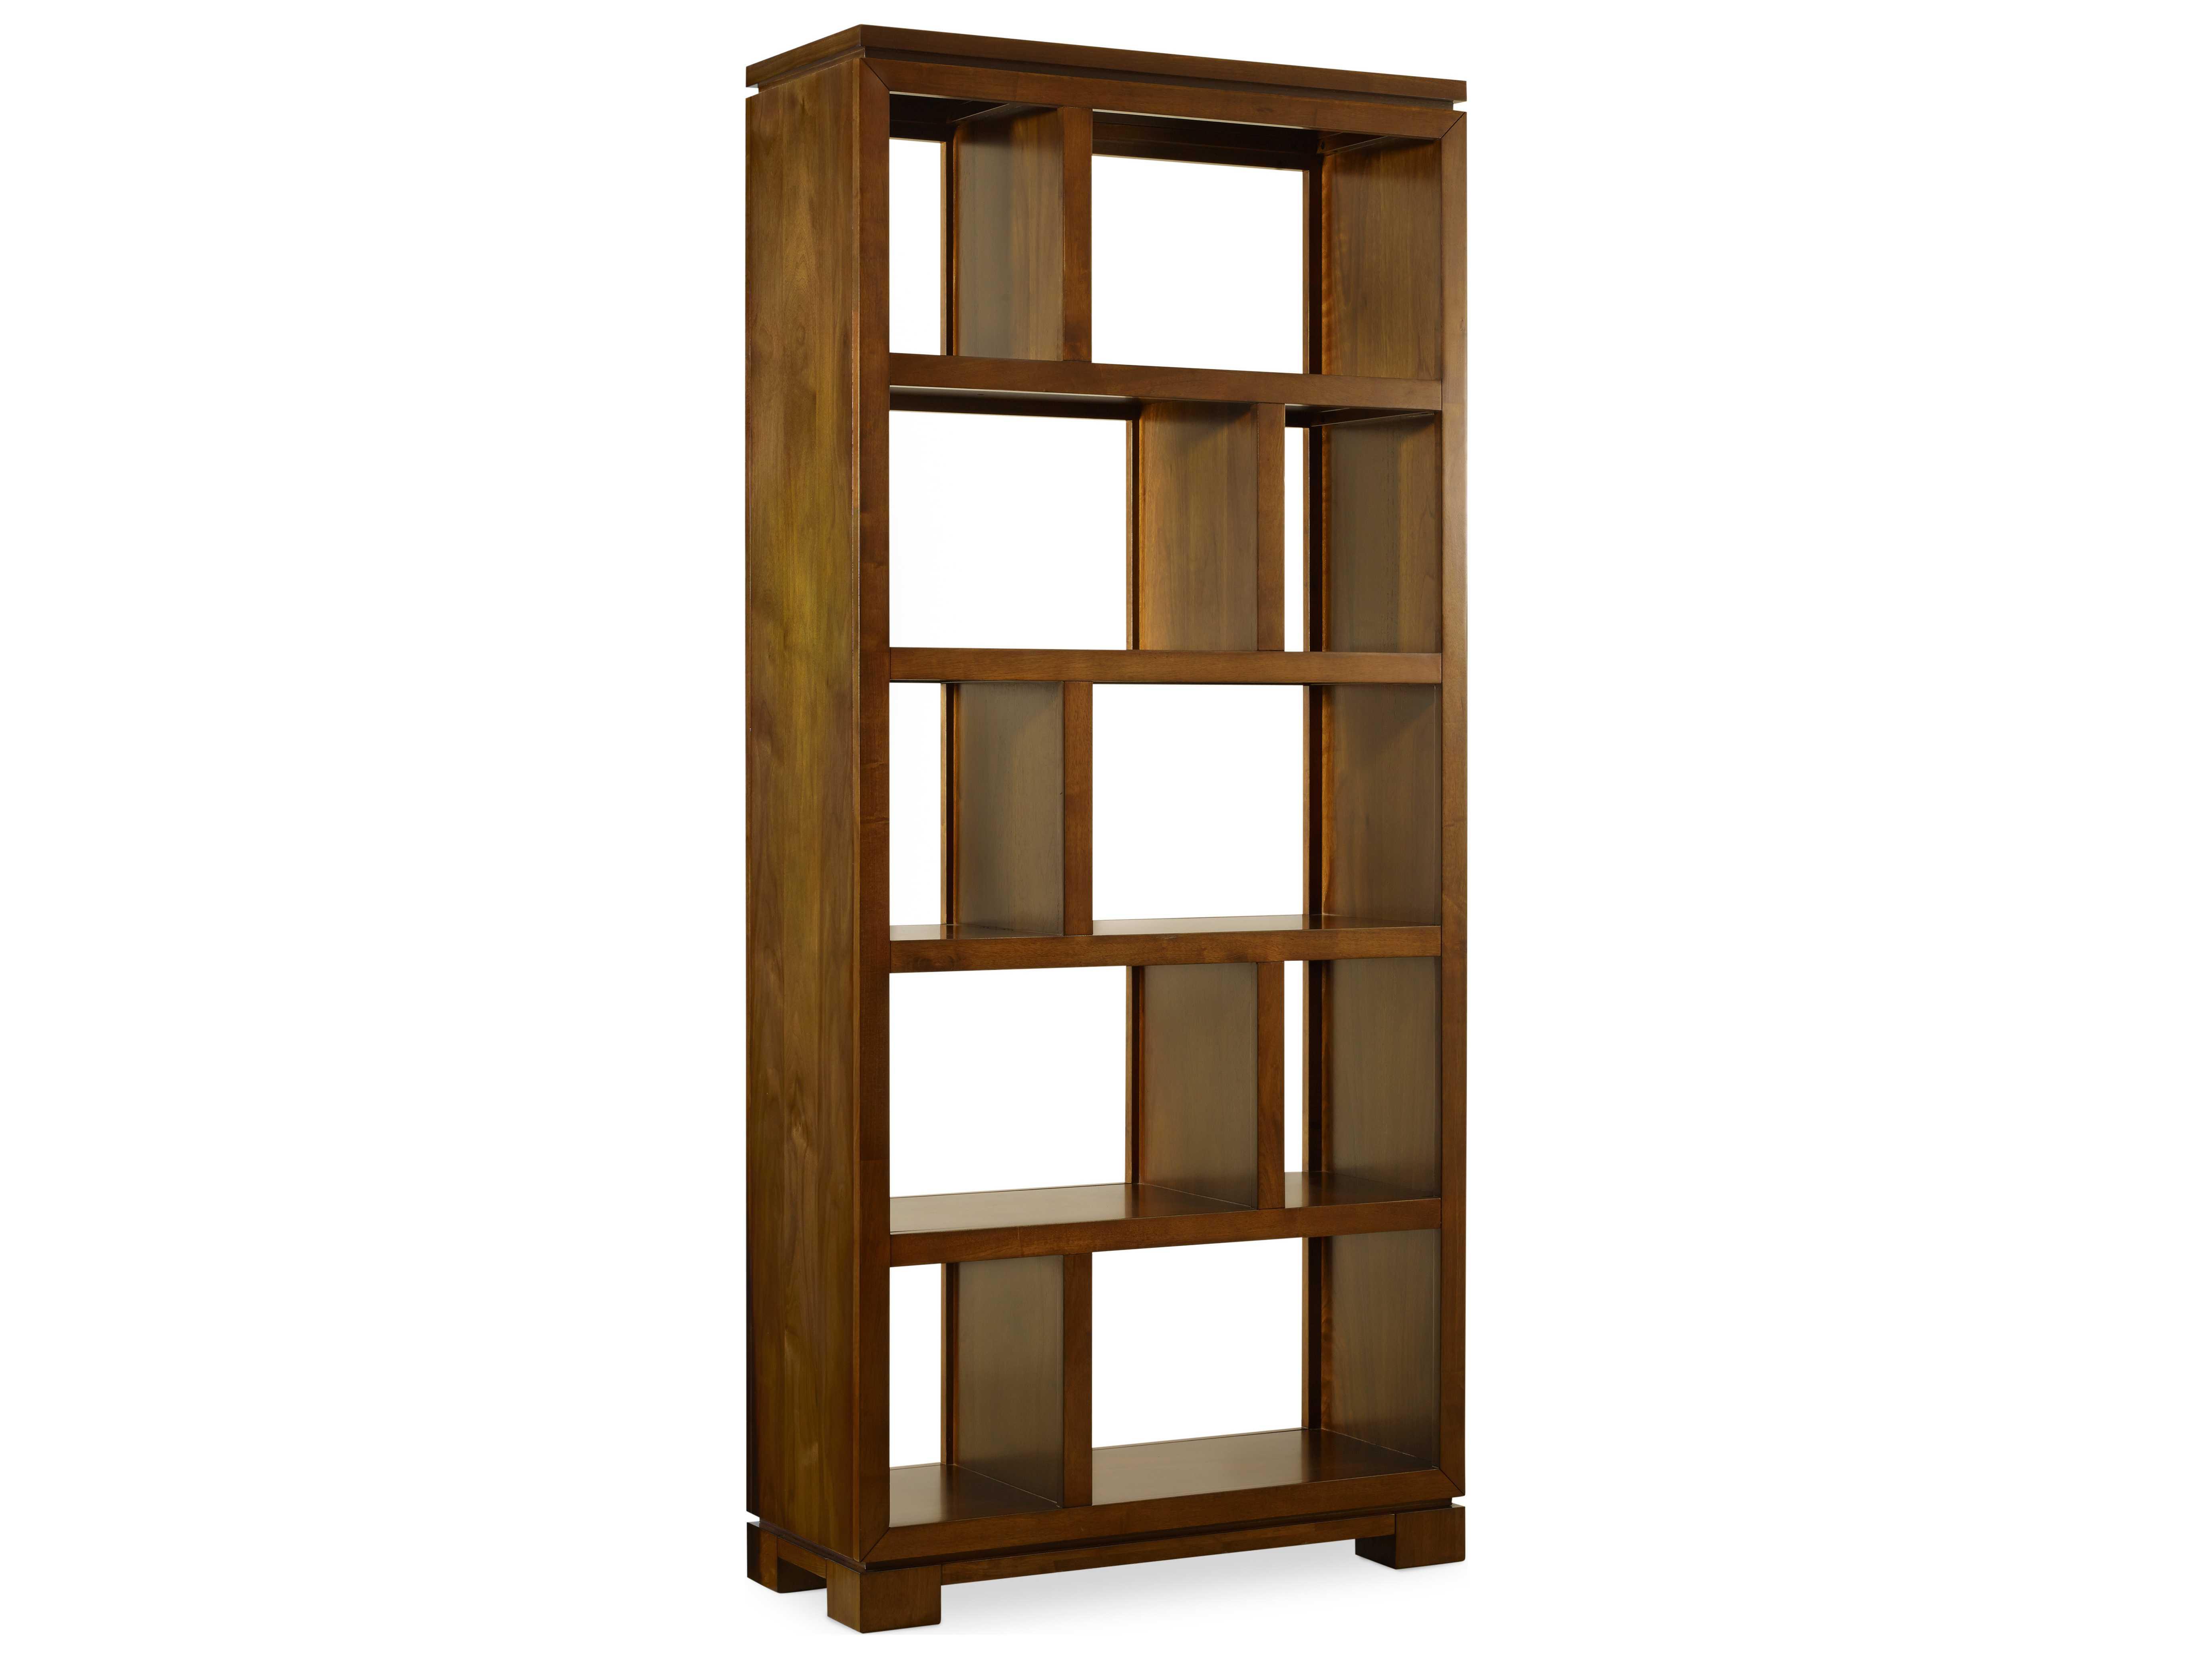 Hooker Furniture Viewpoint Medium Wood Bookcase Room